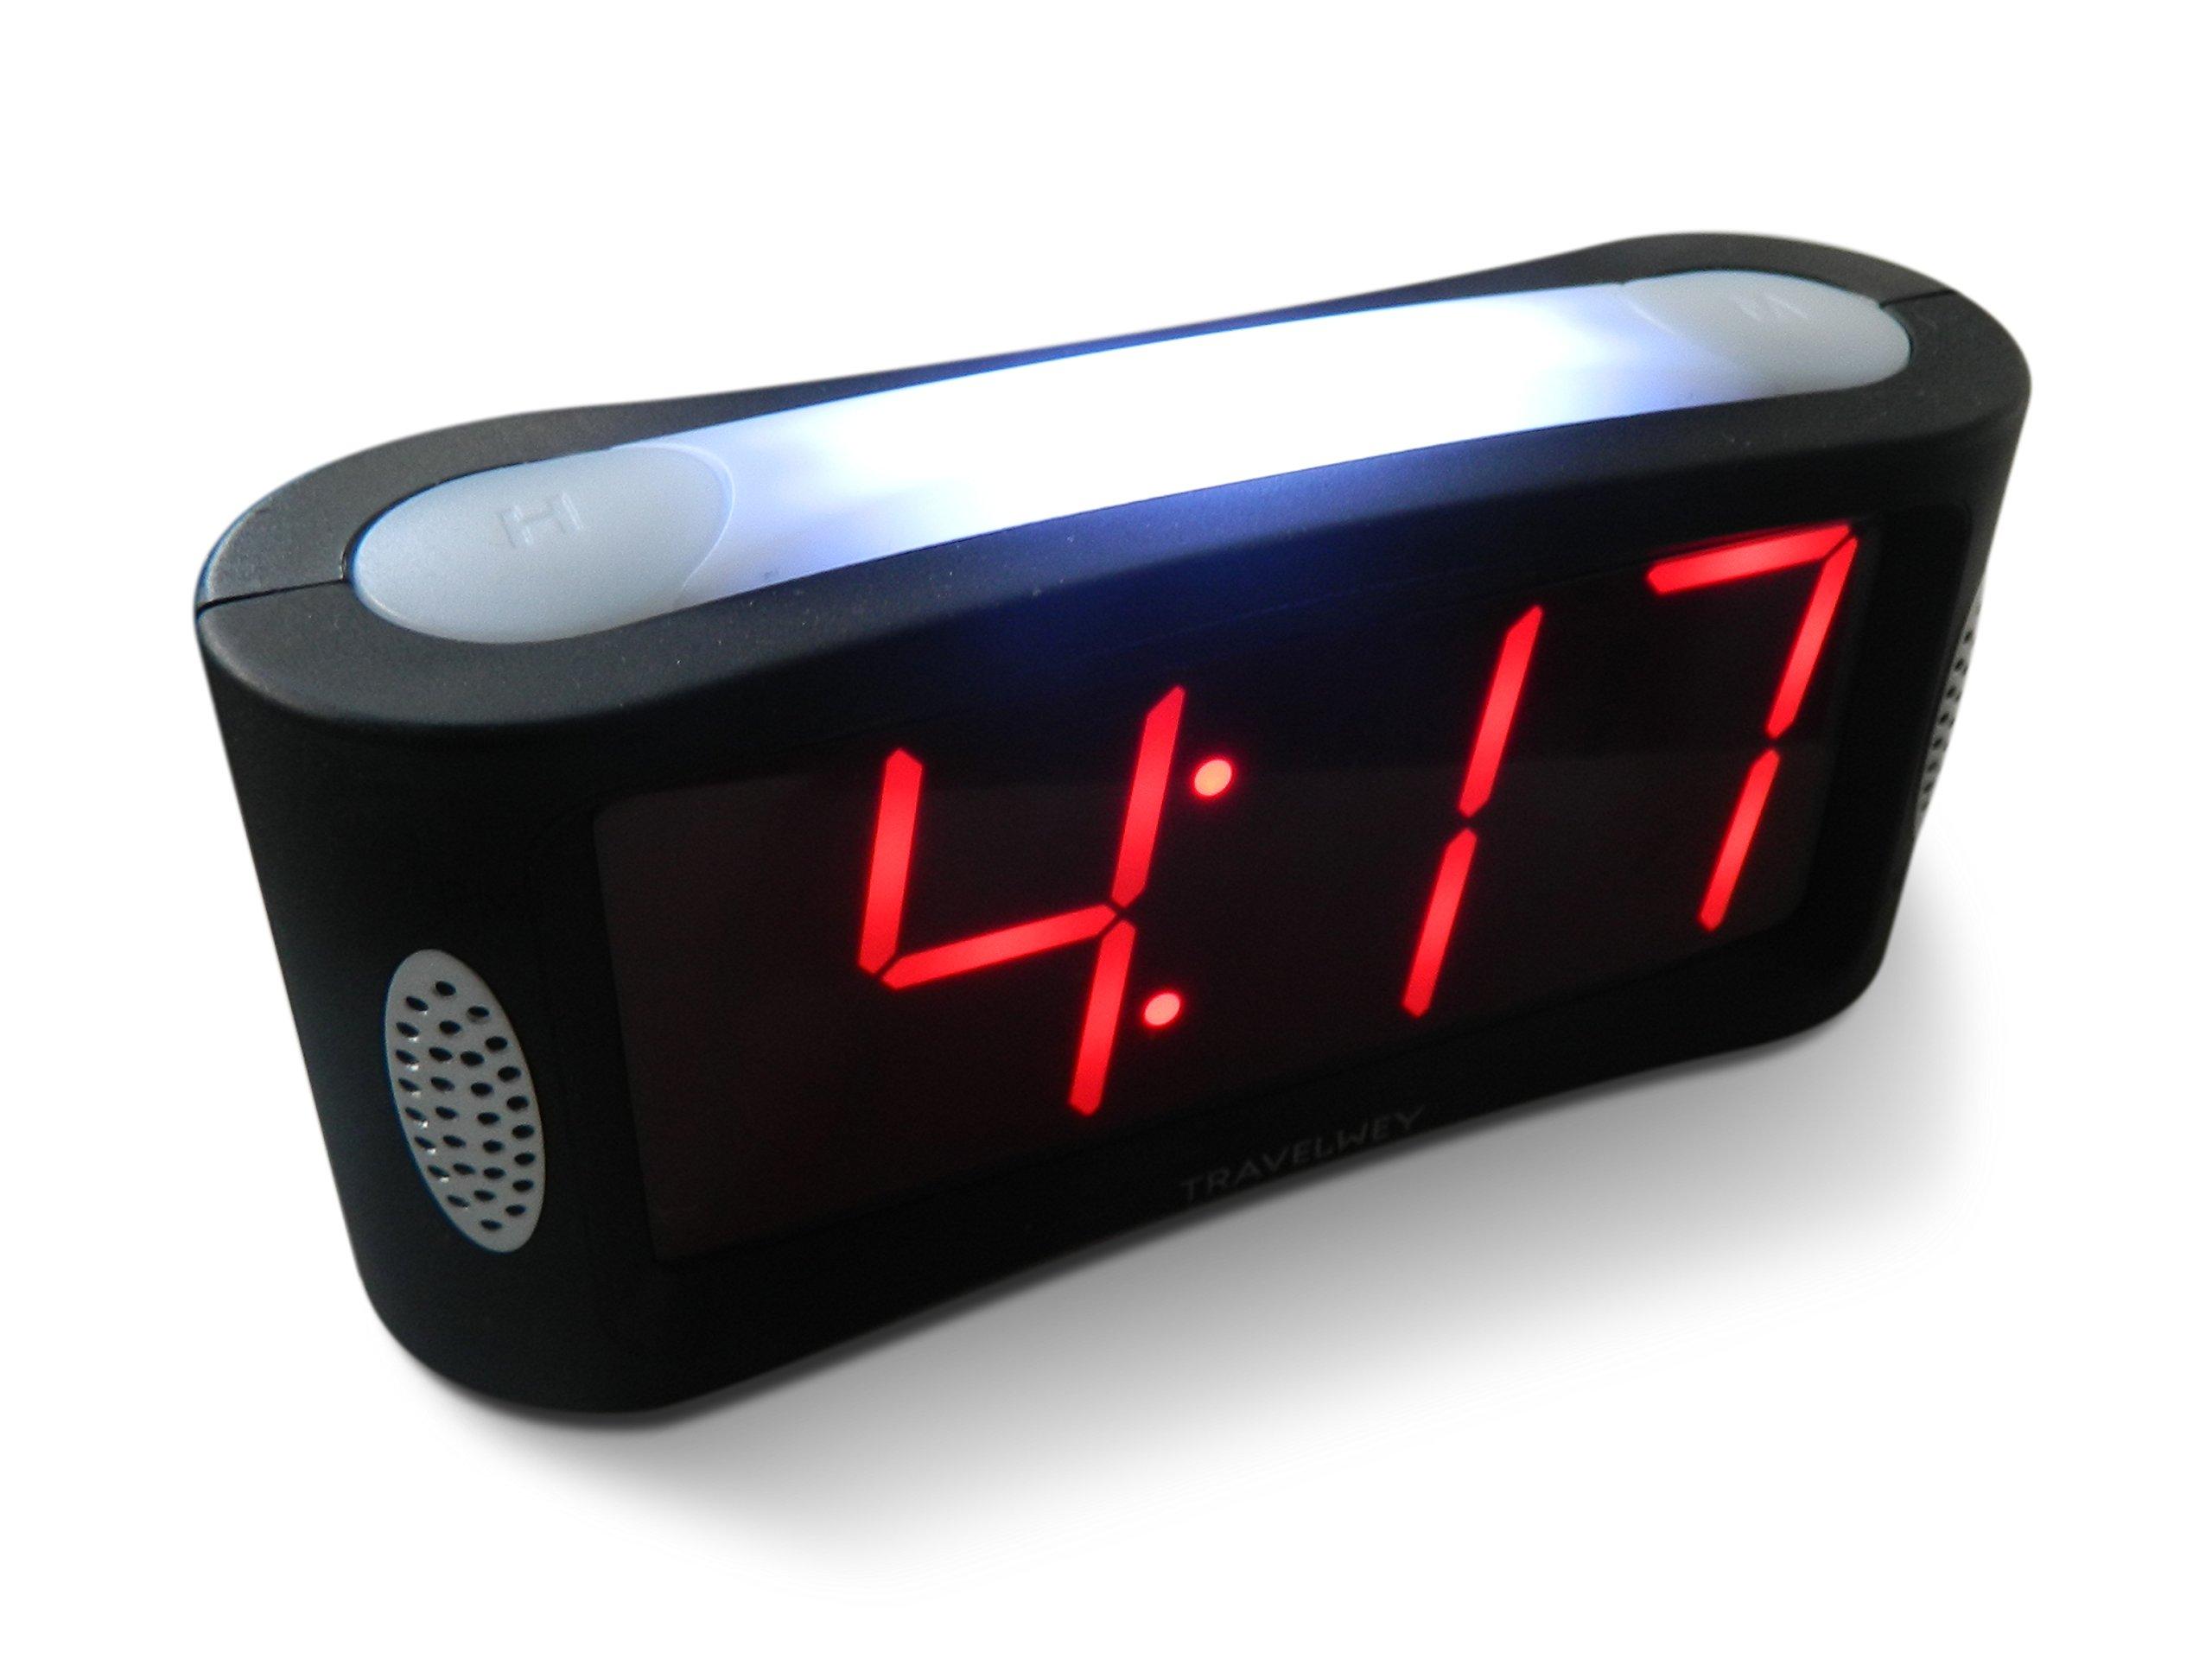 Travelwey Home LED Clock-Outlet Powered, No Frills Simple Operation, Large Night Light, Loud Alarm, Snooze, Full Range Brightness Dimmer, Big Red Digit D Display, Black